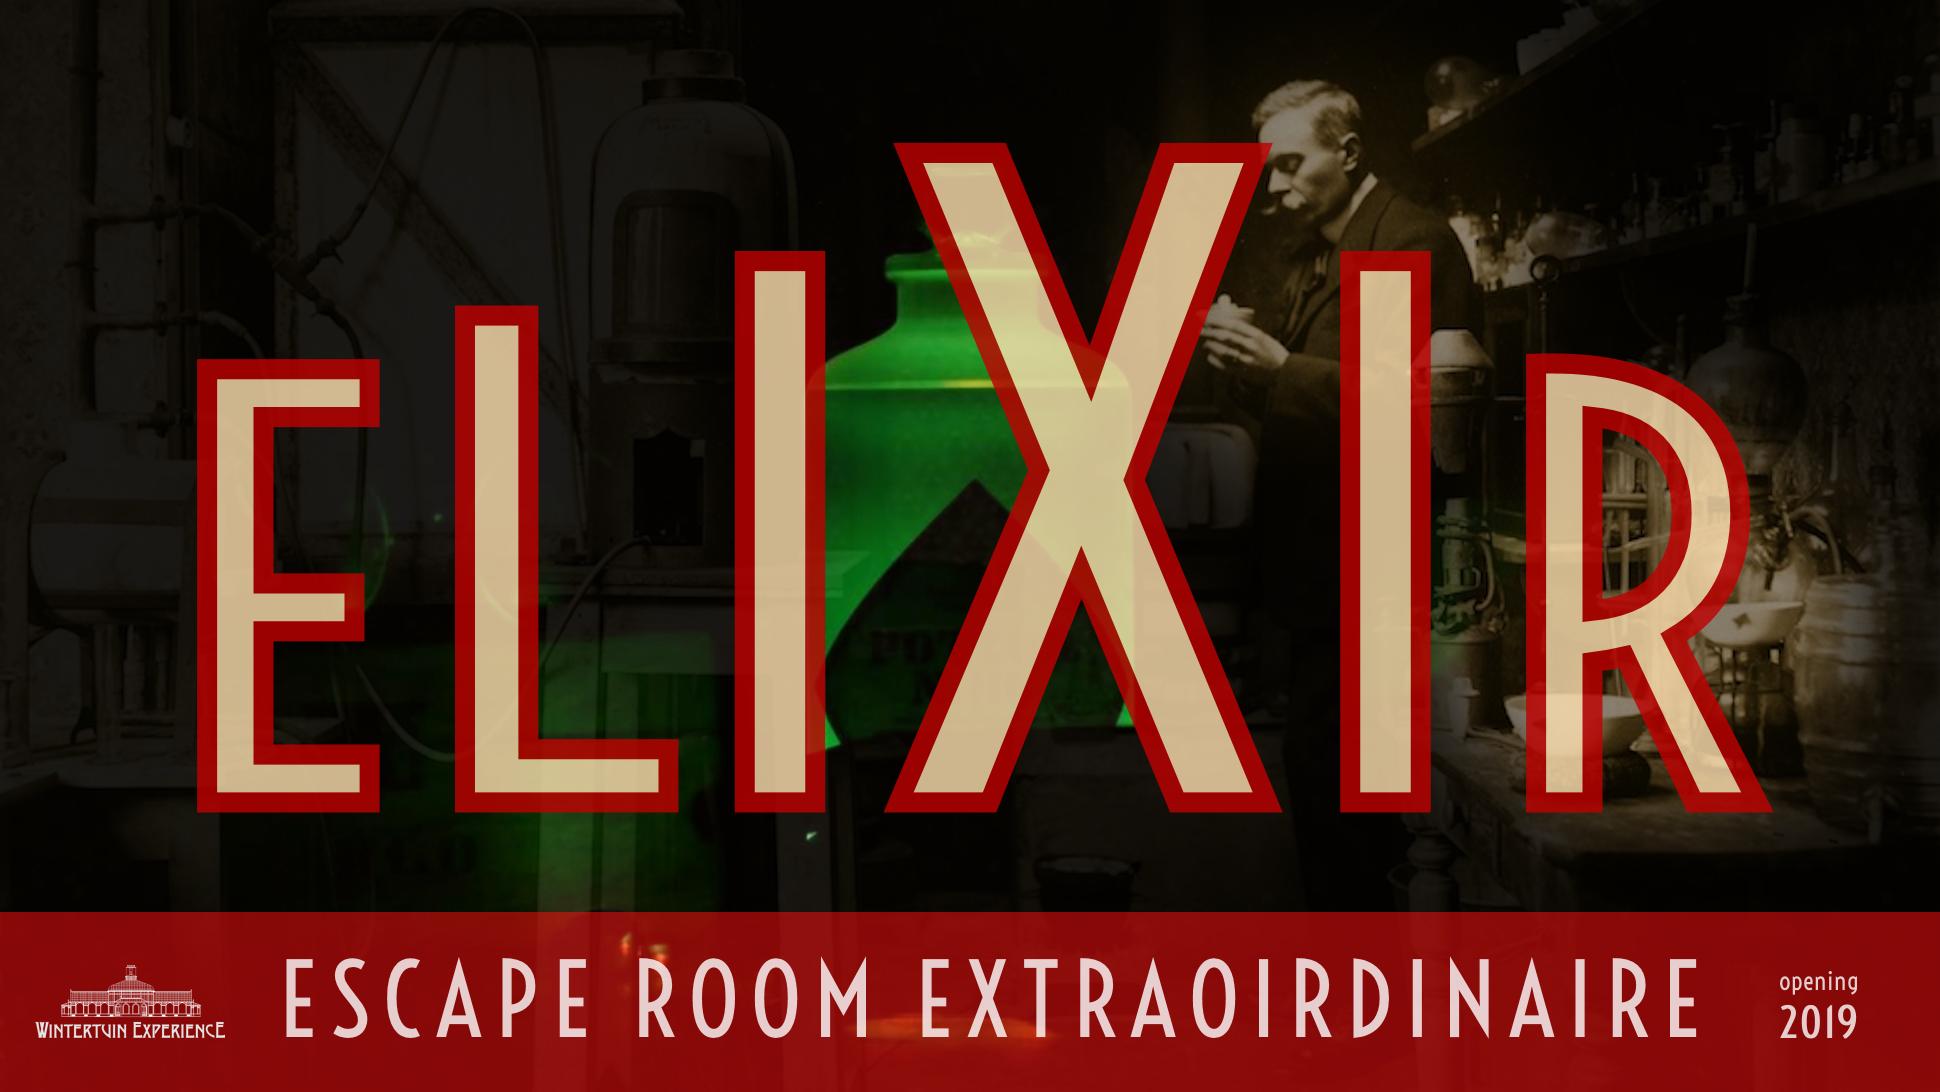 elixir escape room extraordinaire